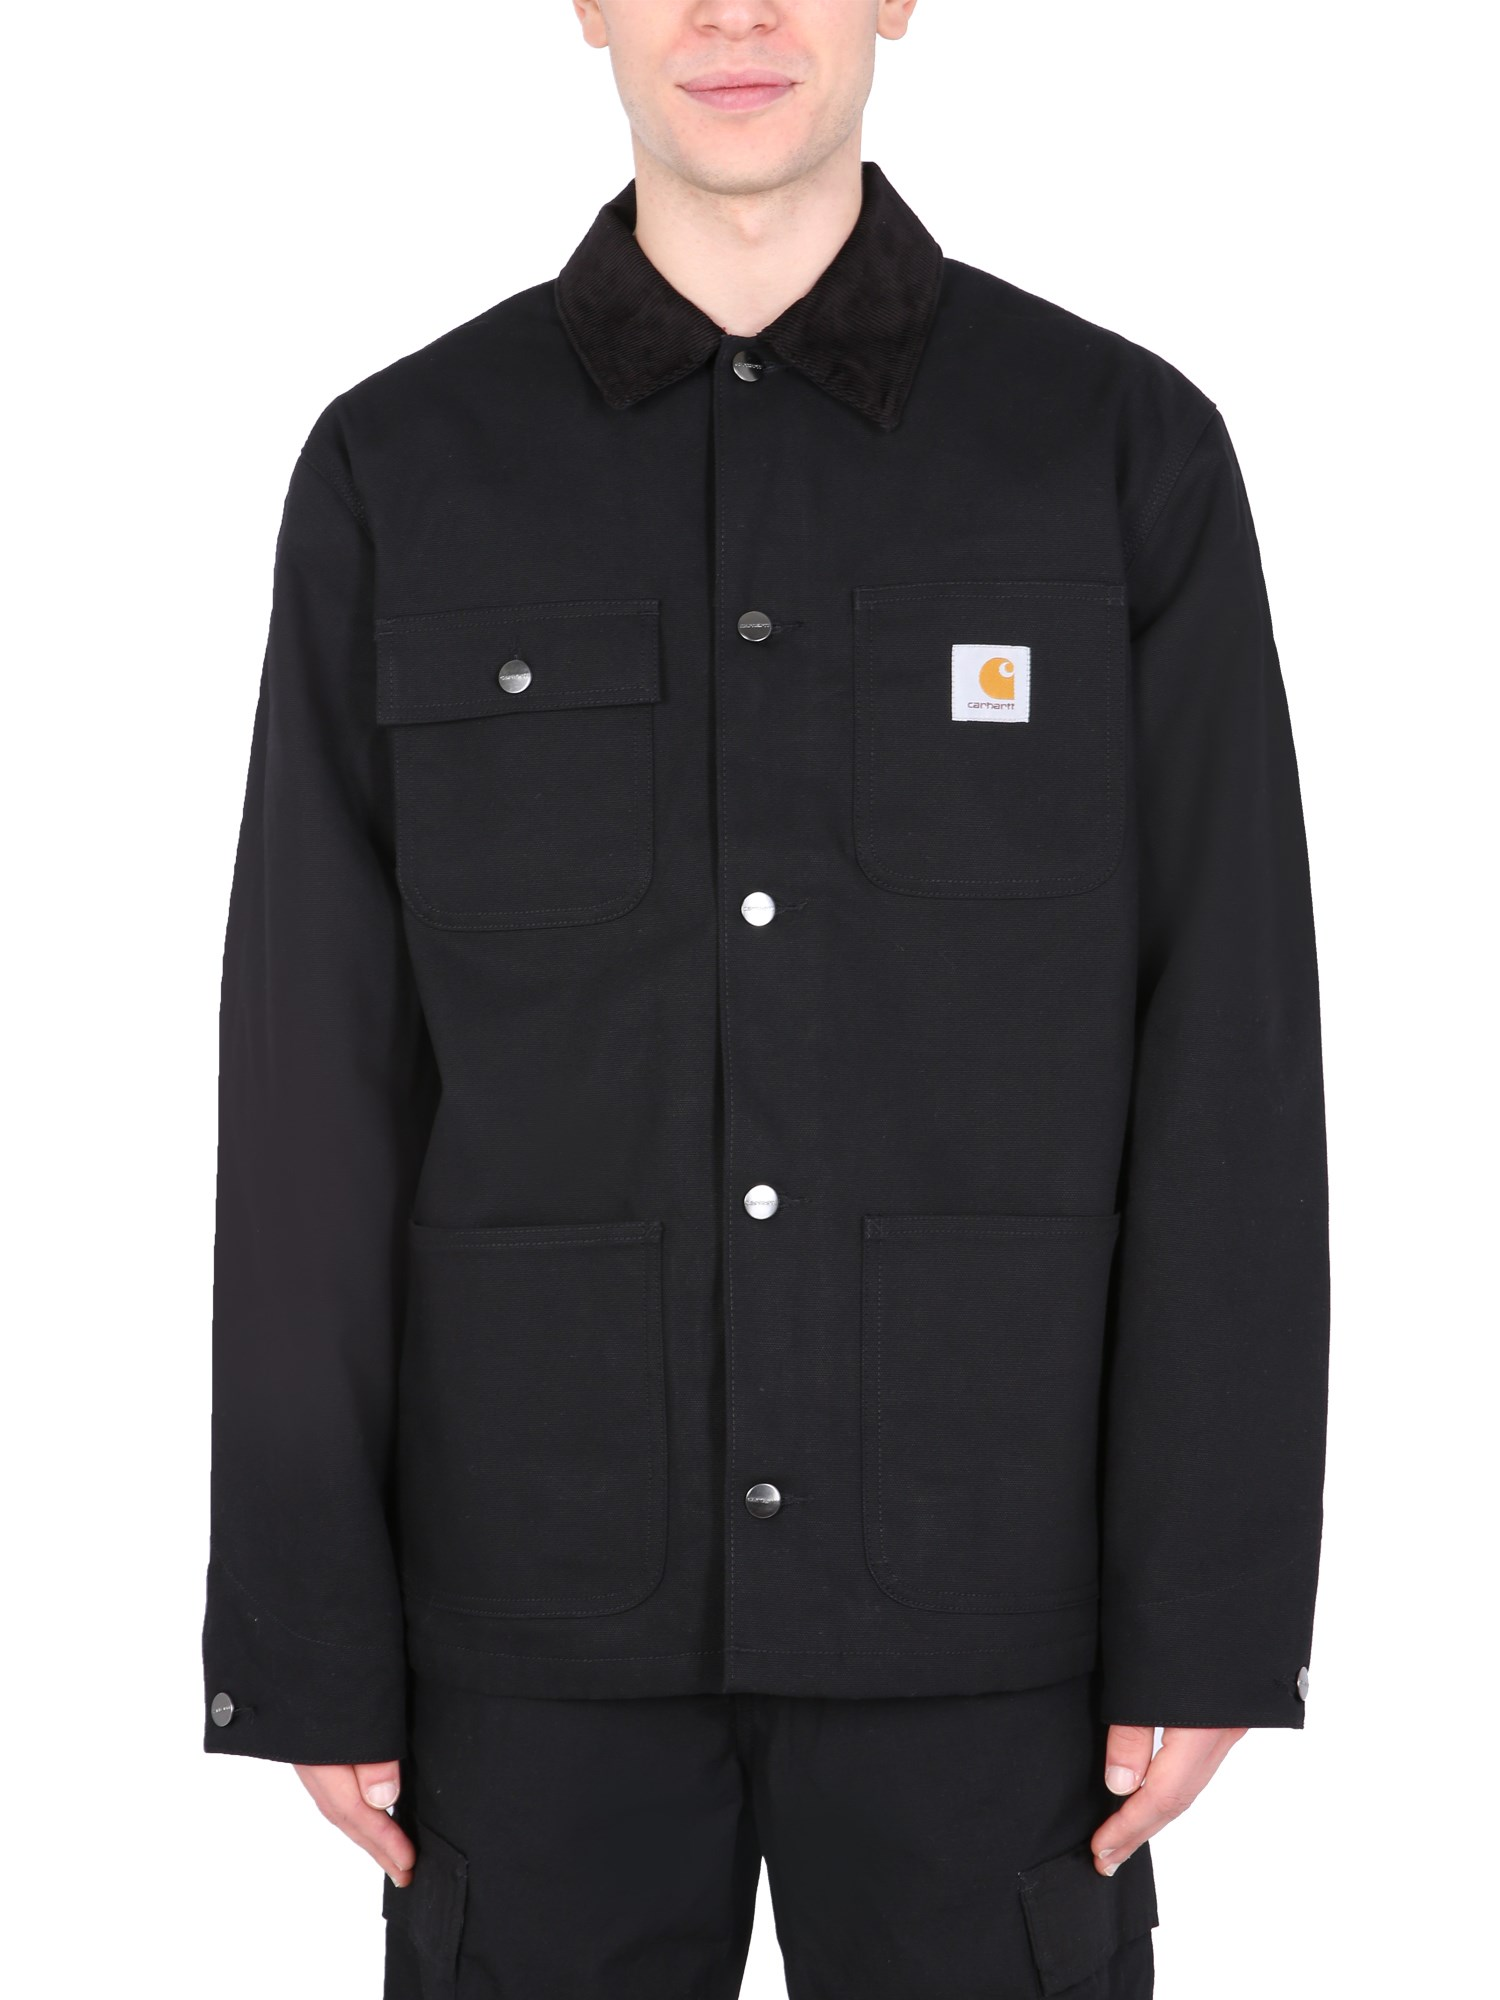 Carhartt wip michigan jacket - carhartt wip - Modalova